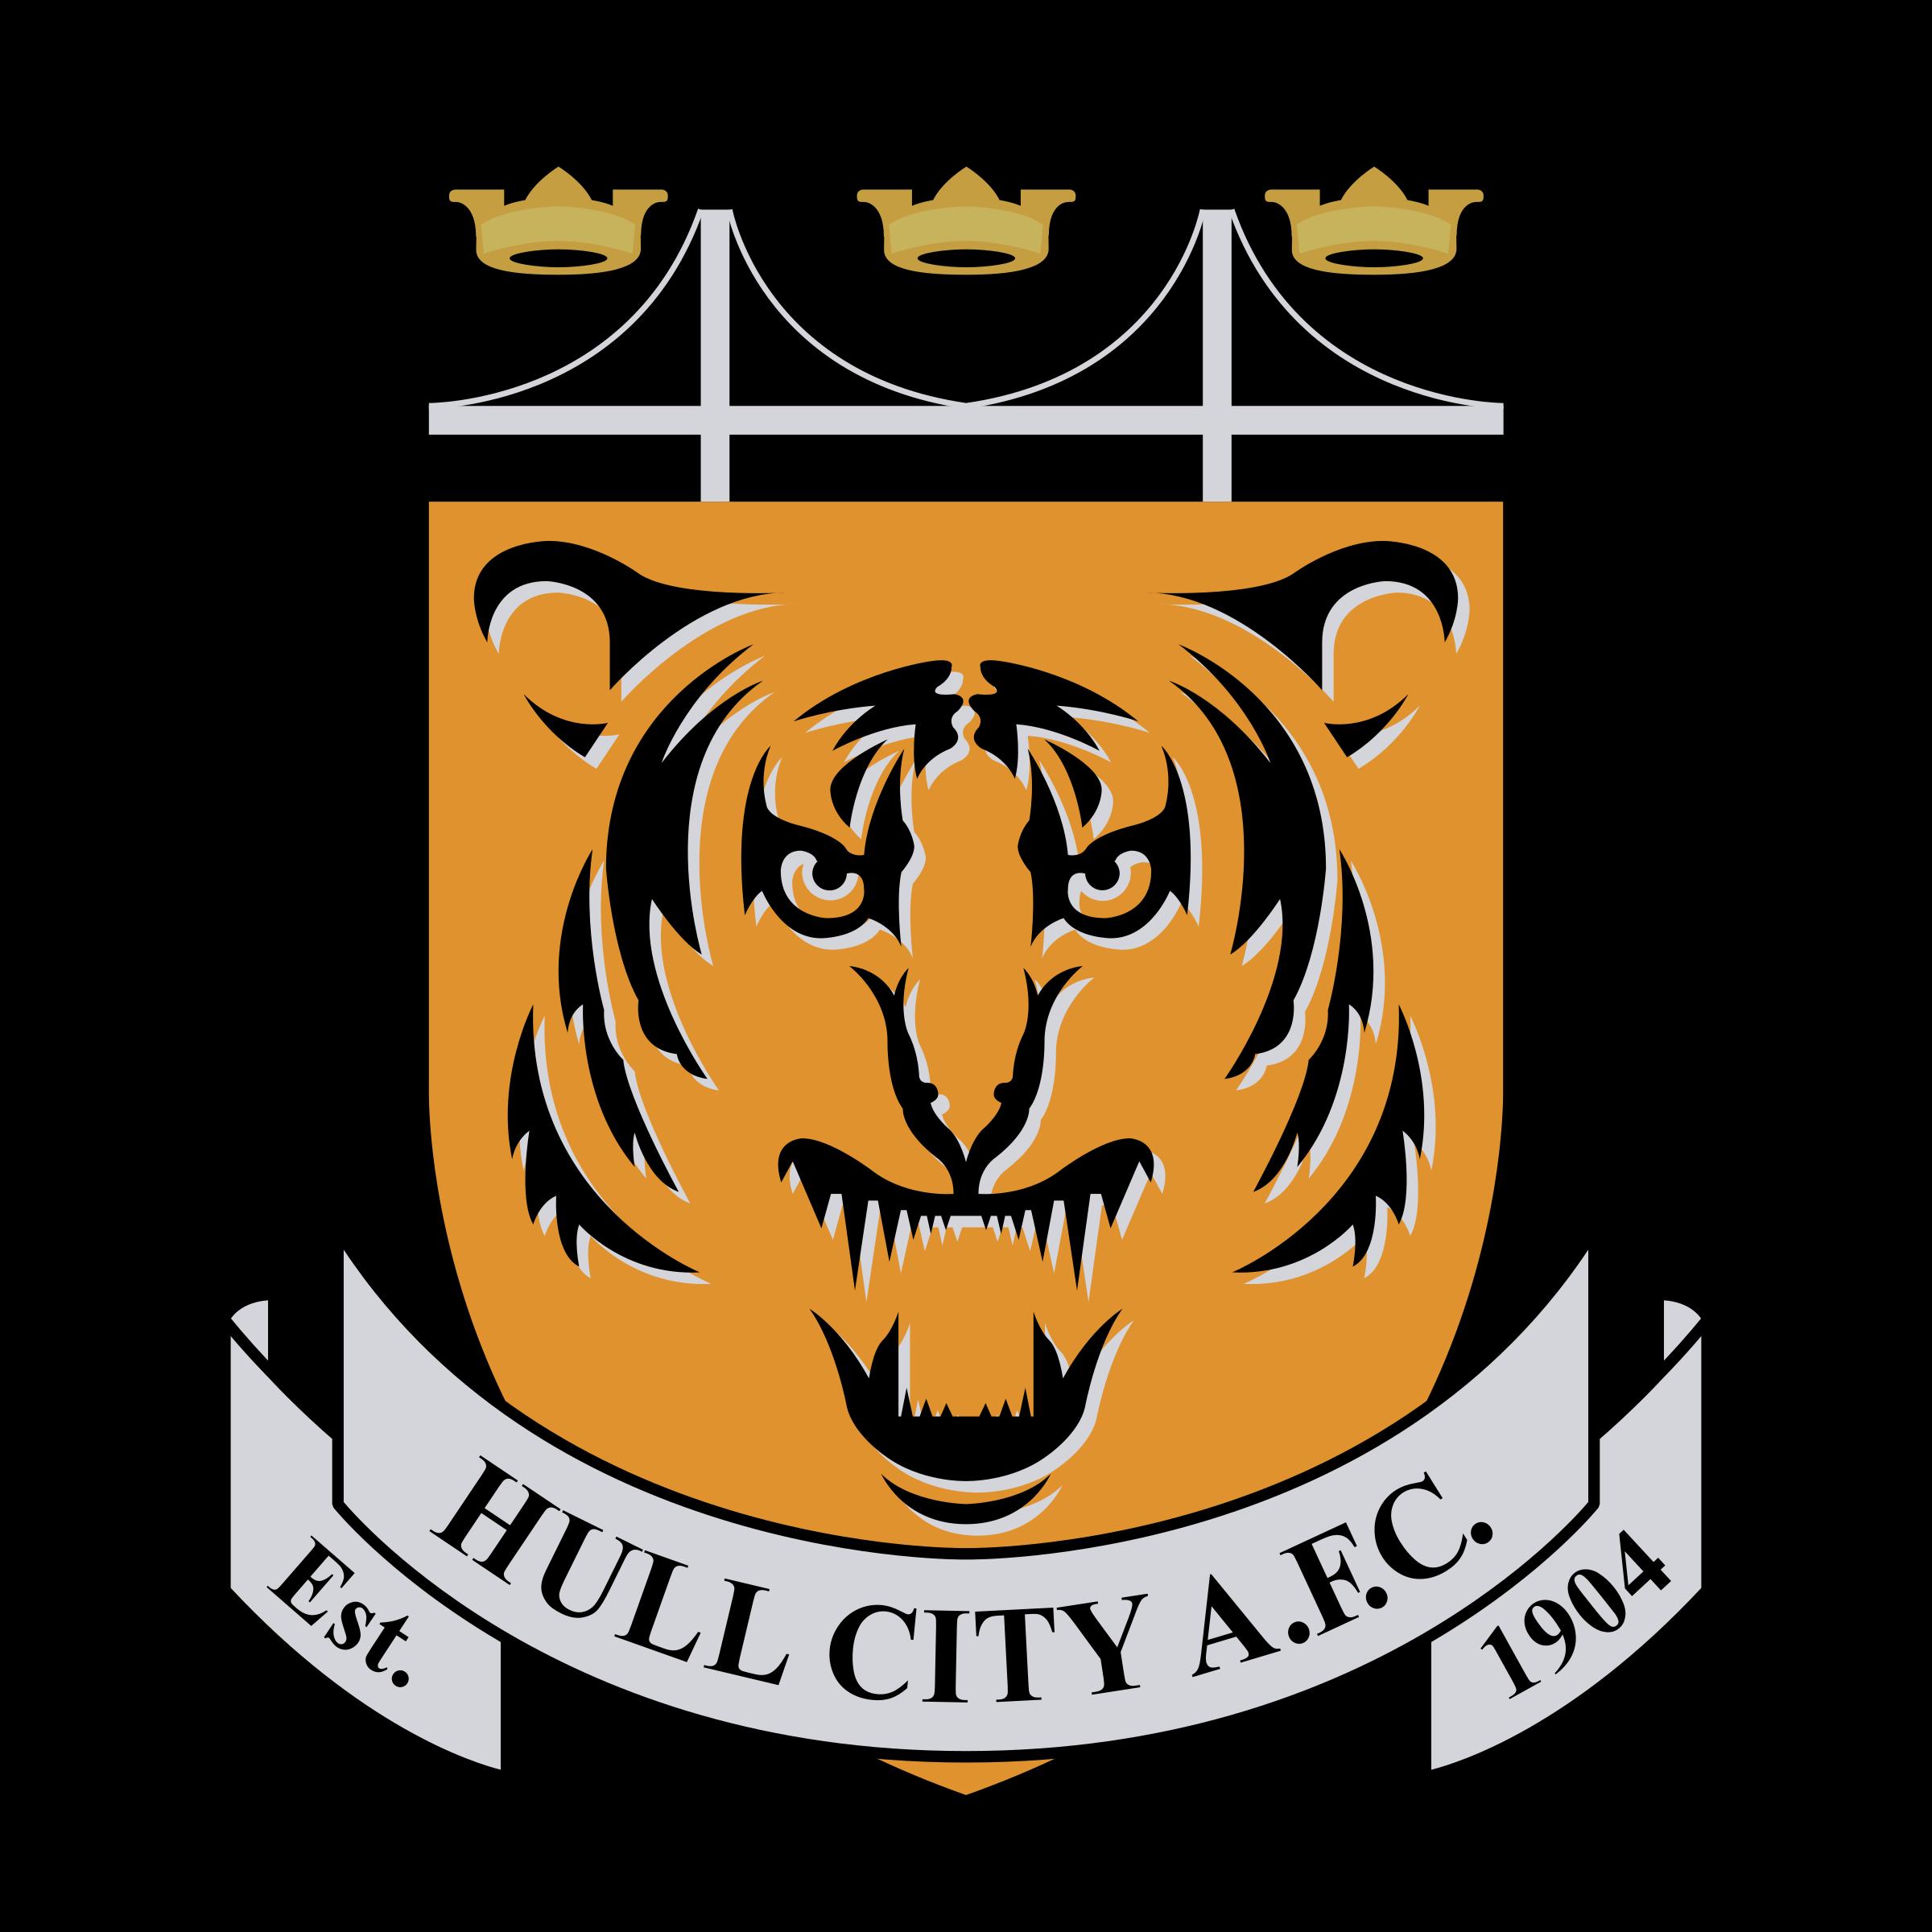 clipart transparent download Vector crest tiger. Hull city fc logo